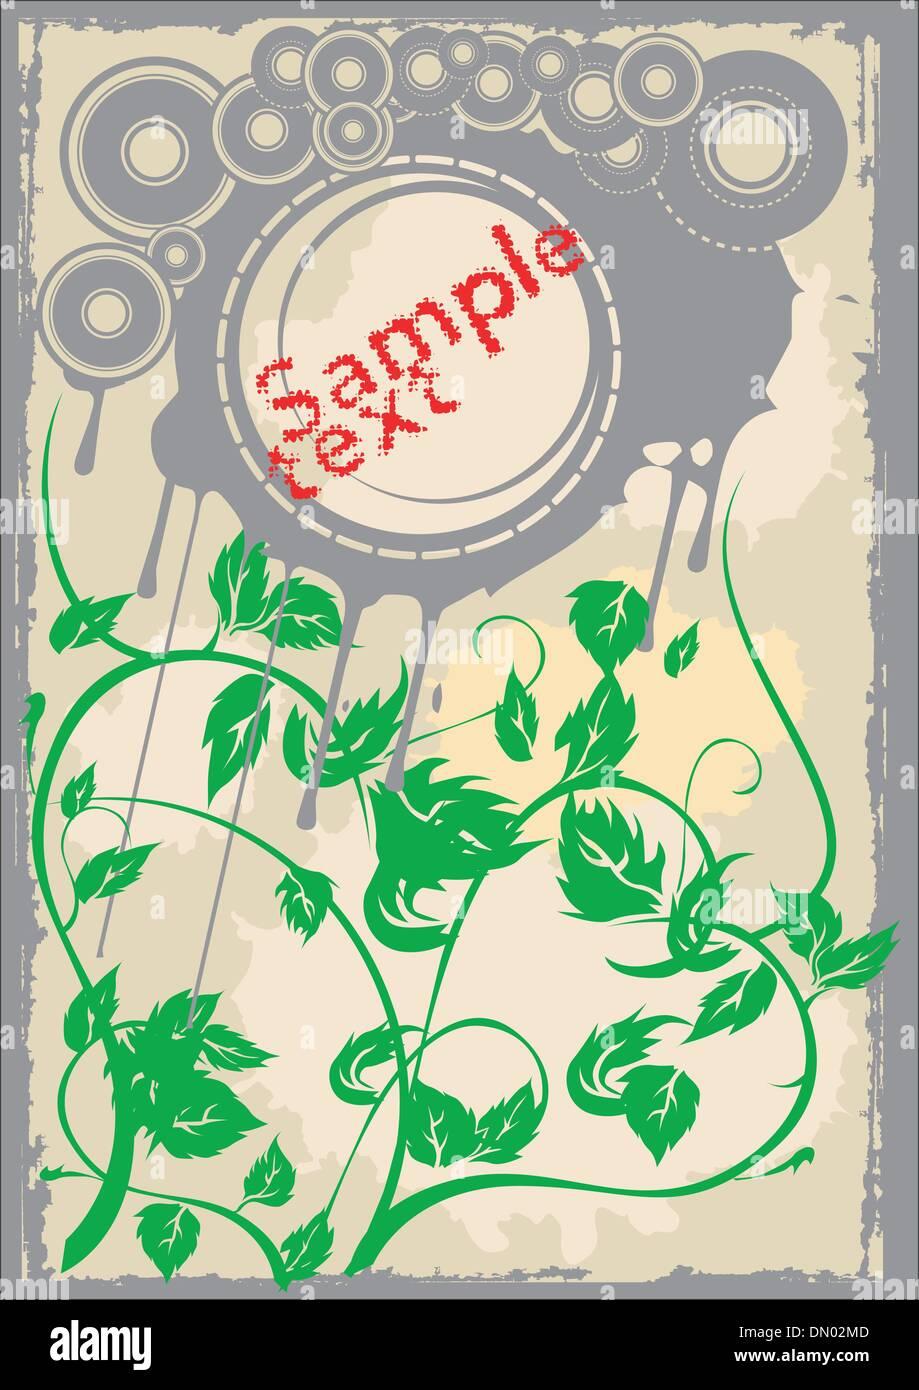 Graue Platten grünes Blatt alte Seite. Flayer. Vektor-Illustration. Keine Netze. Stock Vektor